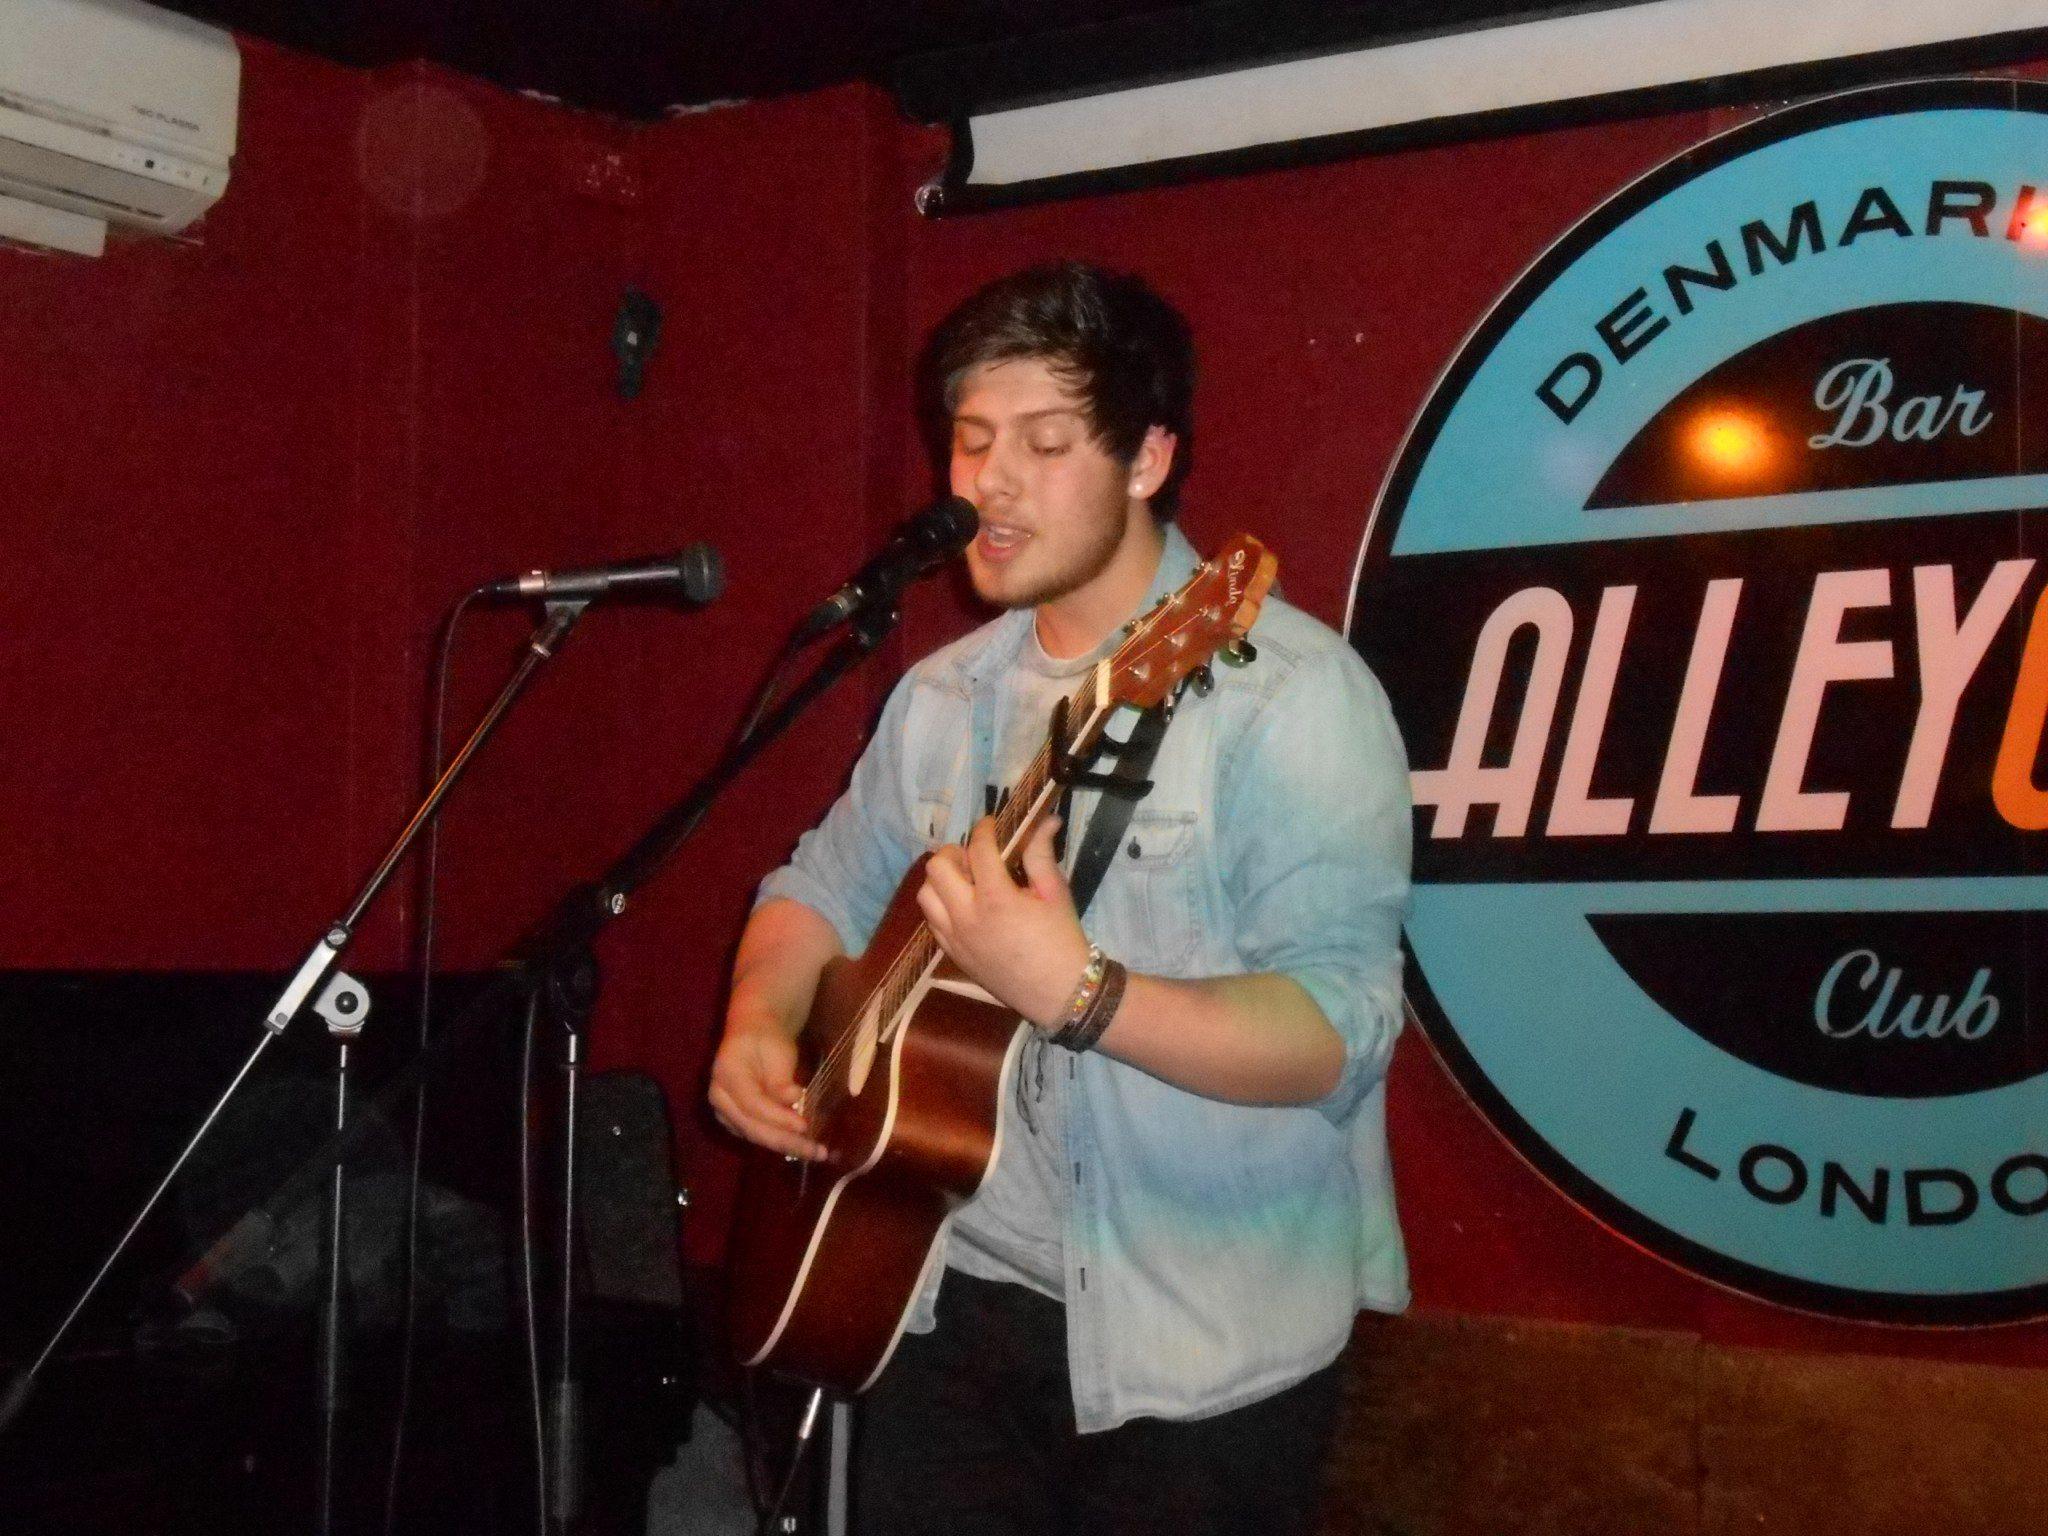 Josh Massey alley cat